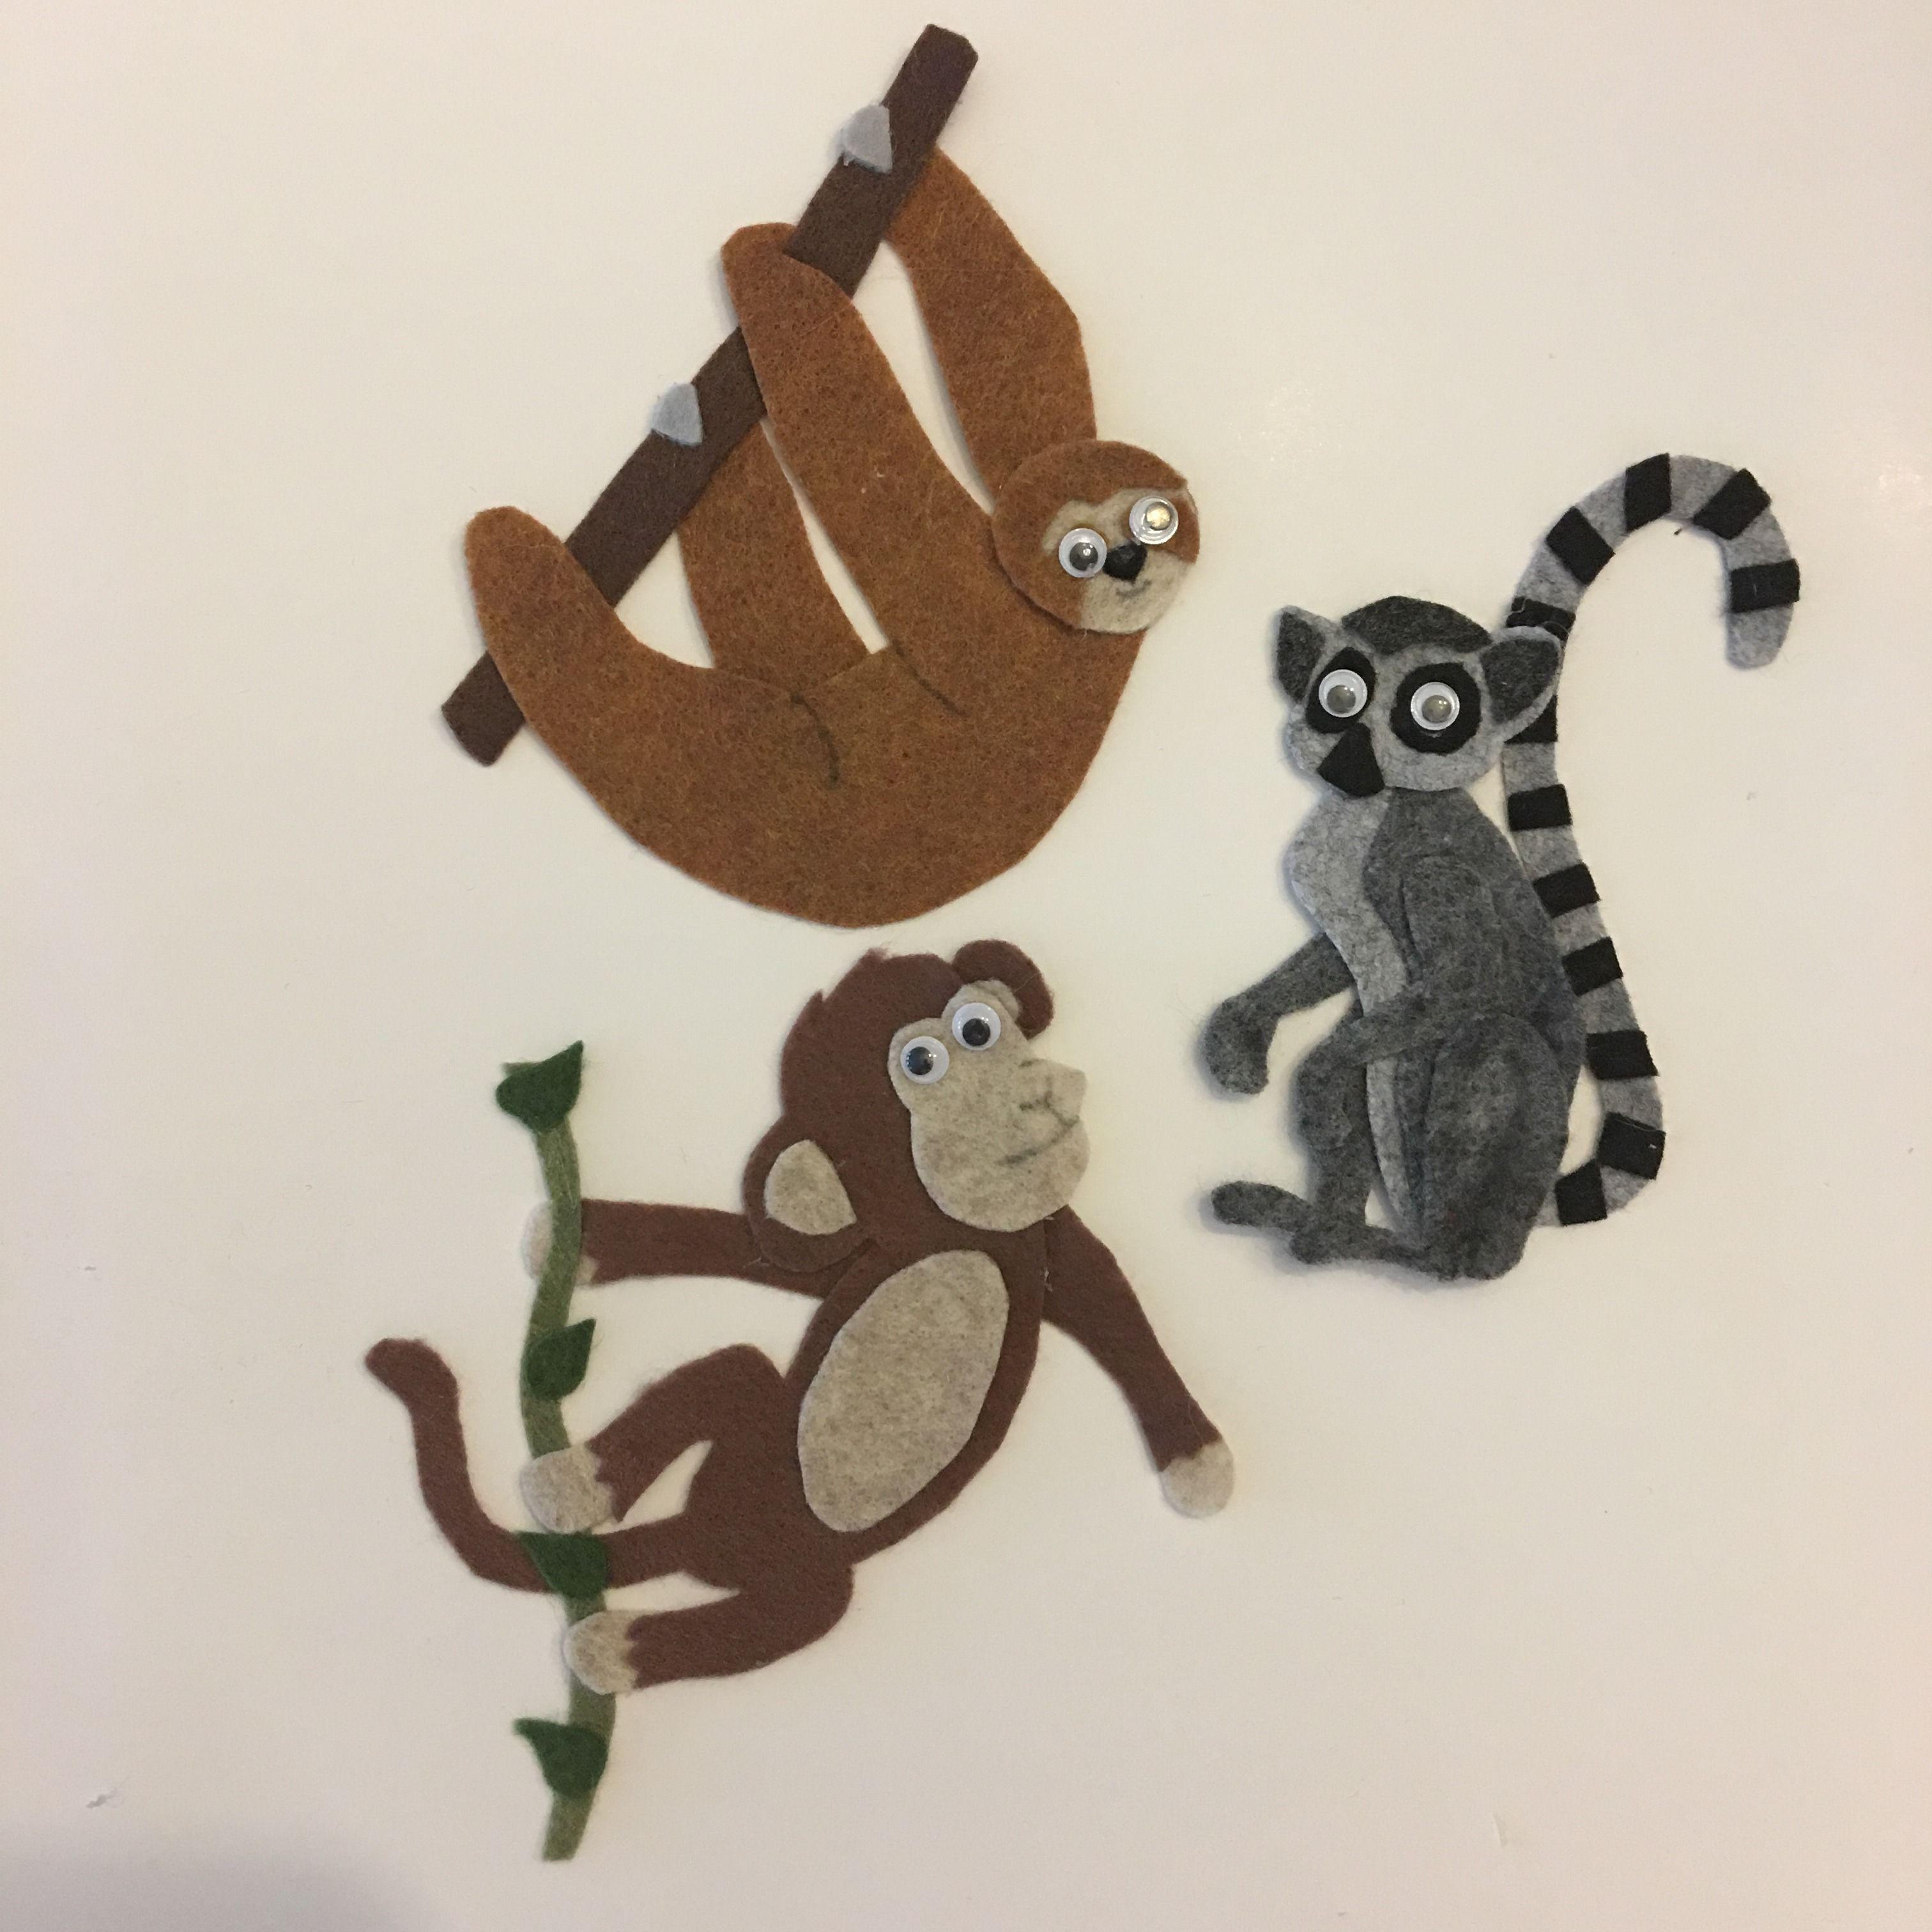 Felt Die cuts 3 handmade squirrels with acorns Embellishments Card topper.